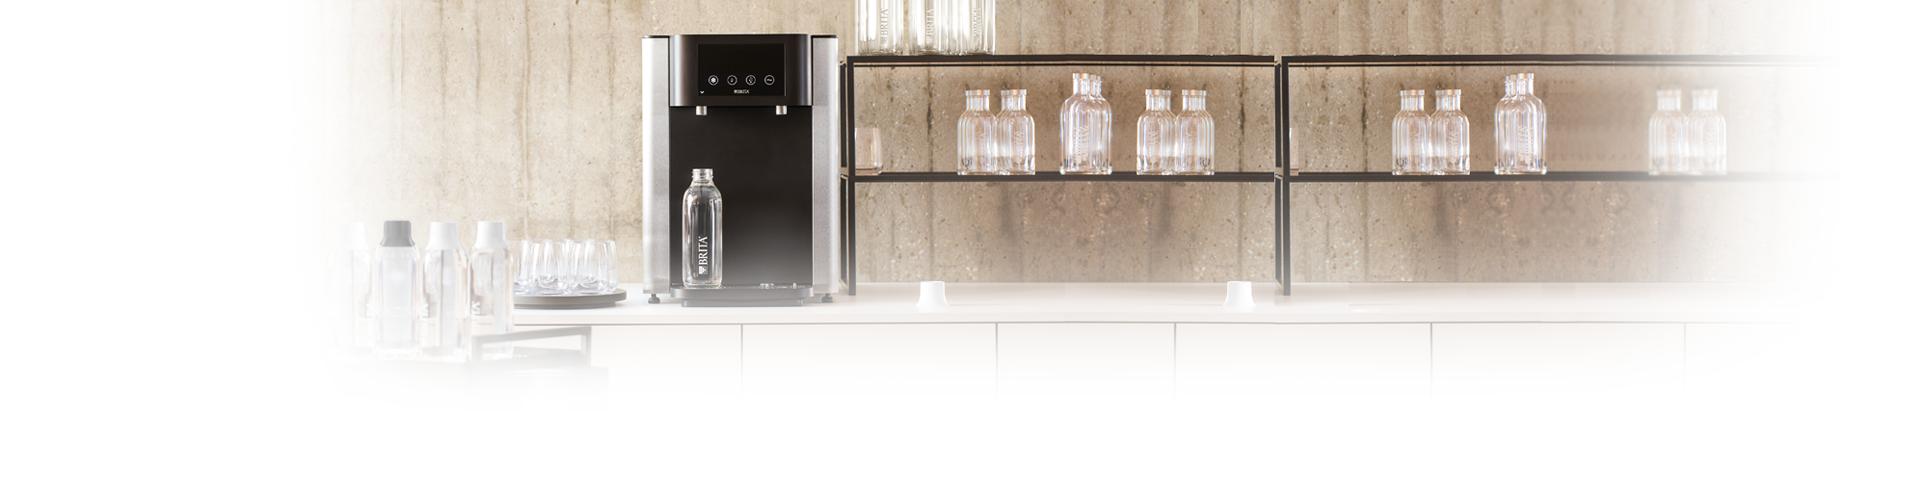 BRITA dispenser on the bar